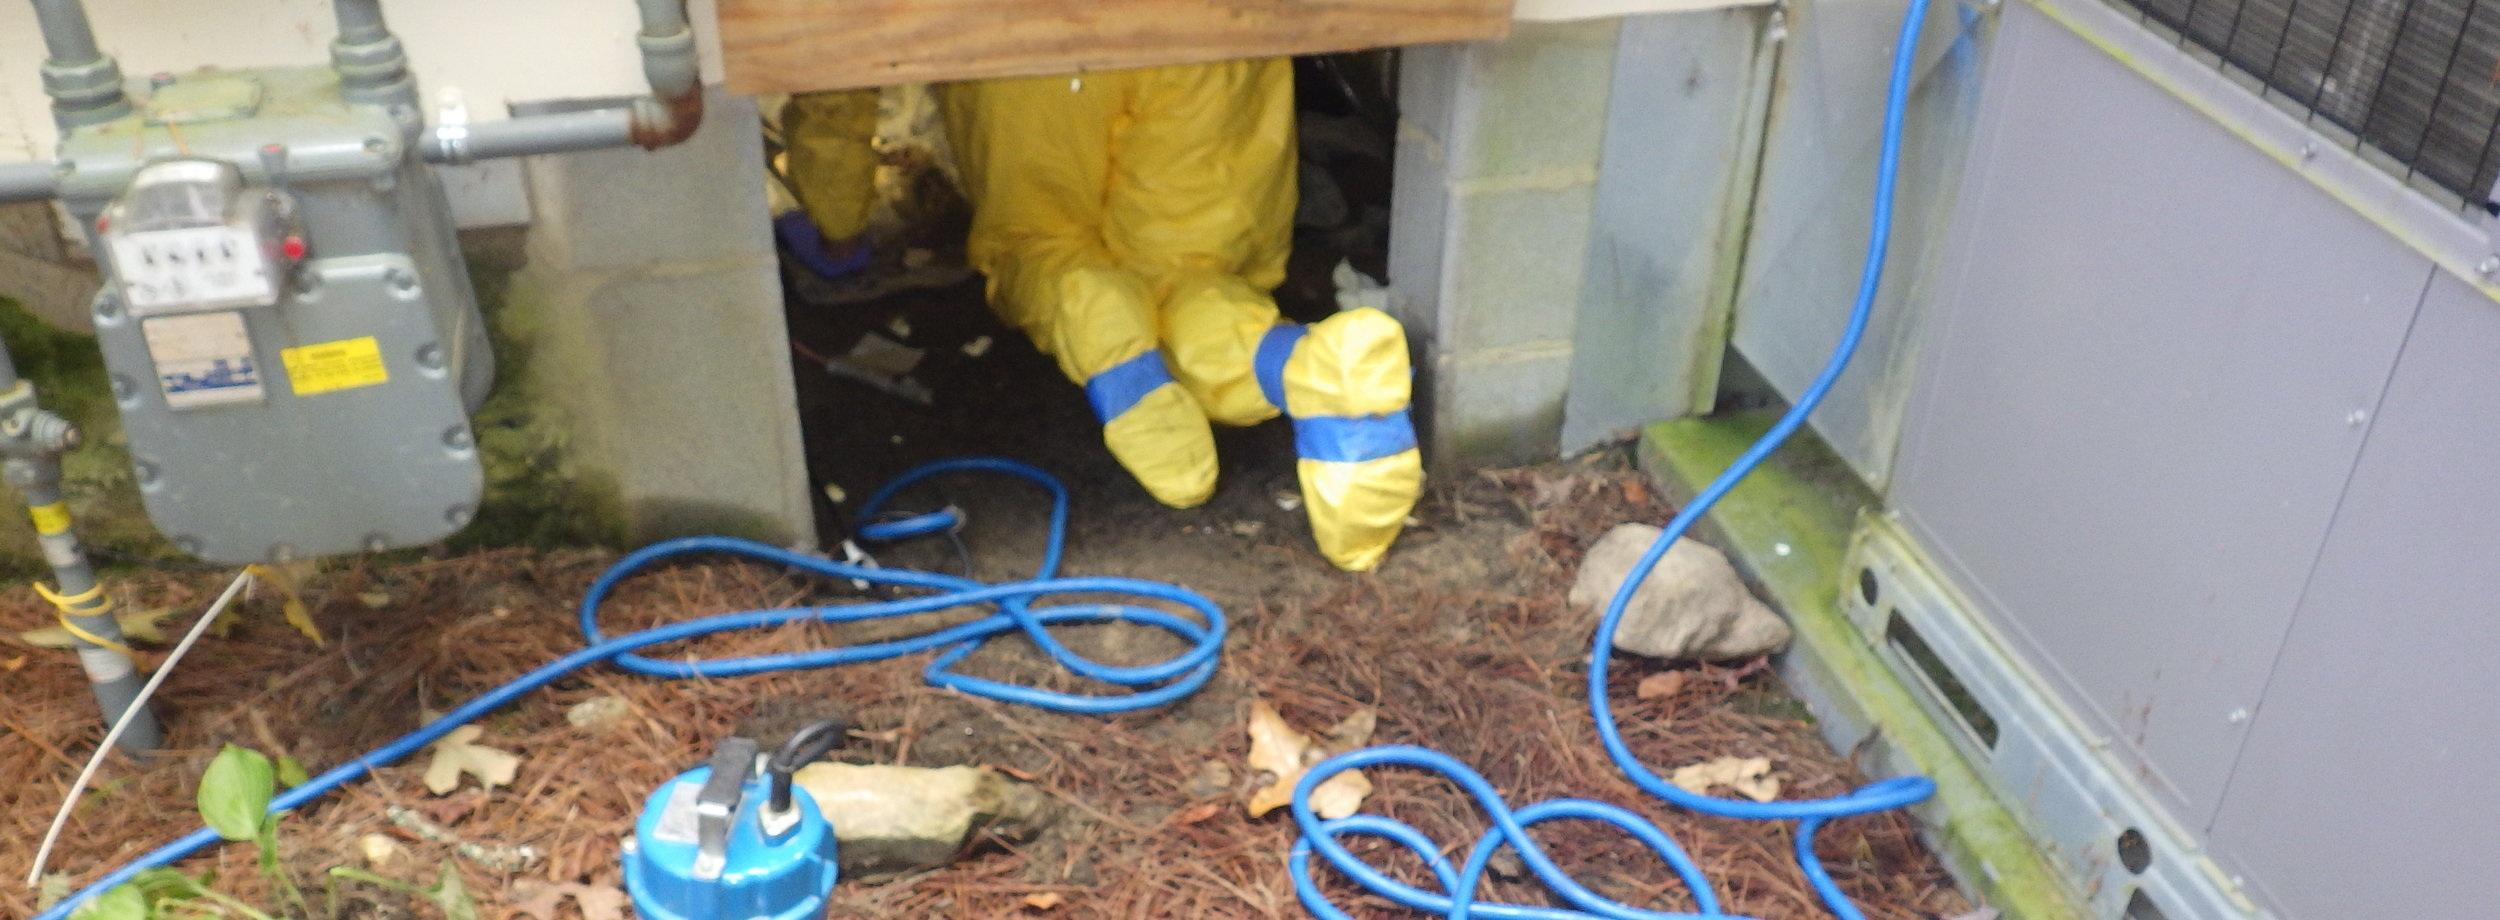 sewage-backup-cleanup